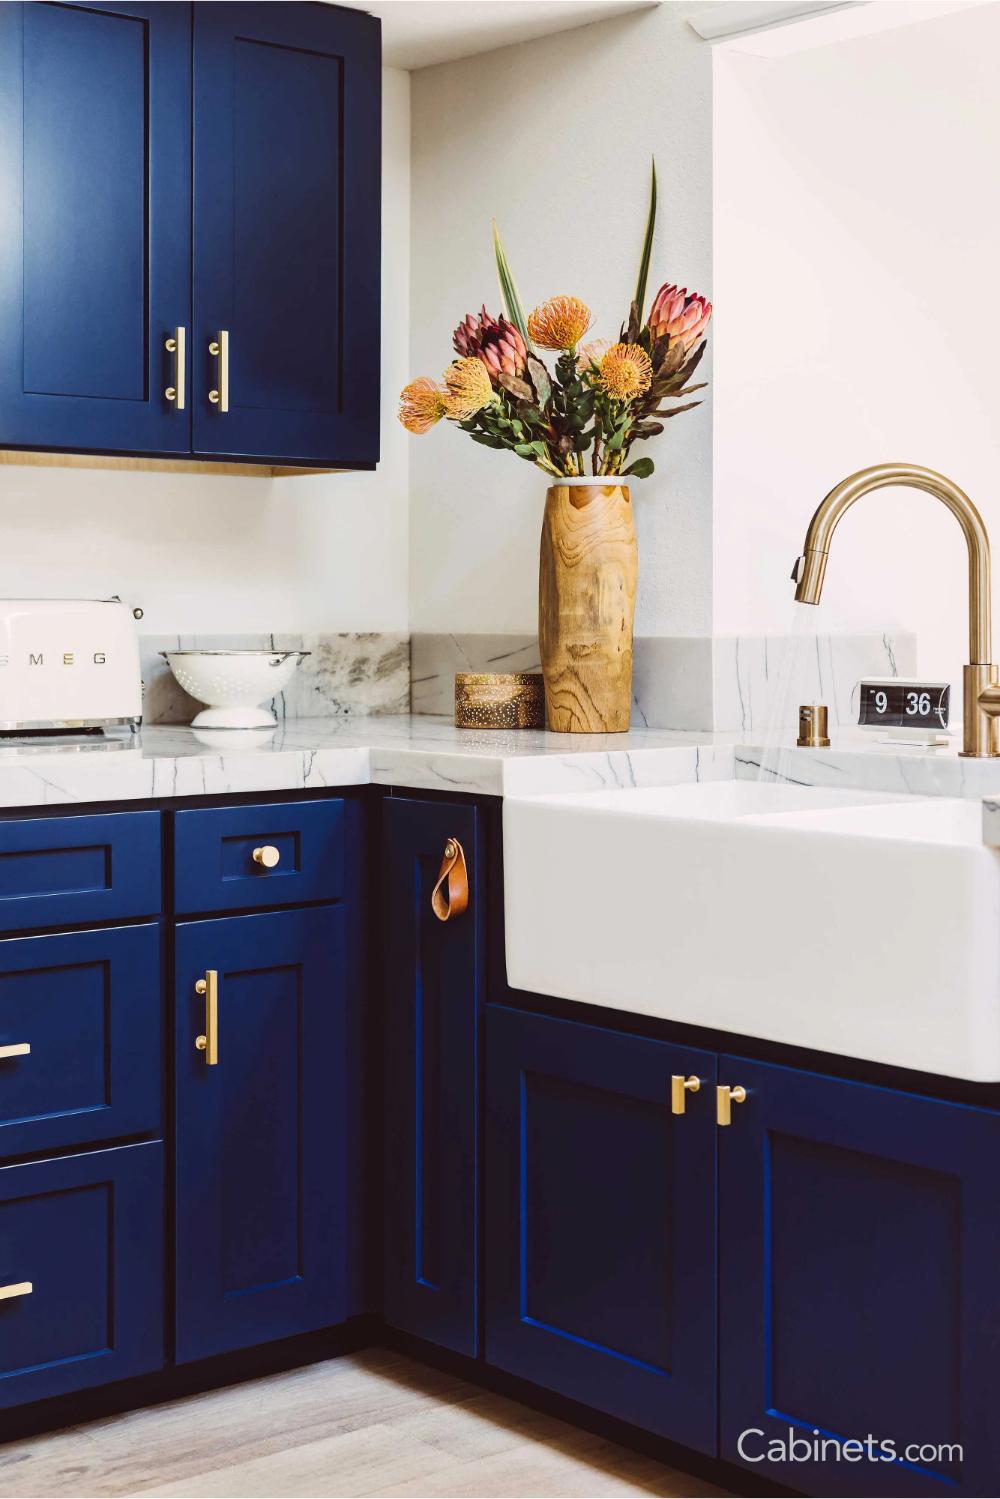 mid century modern navy kitchen with quartzite countertops cabinets com in 2020 diy kitchen on kitchen decor navy id=24535